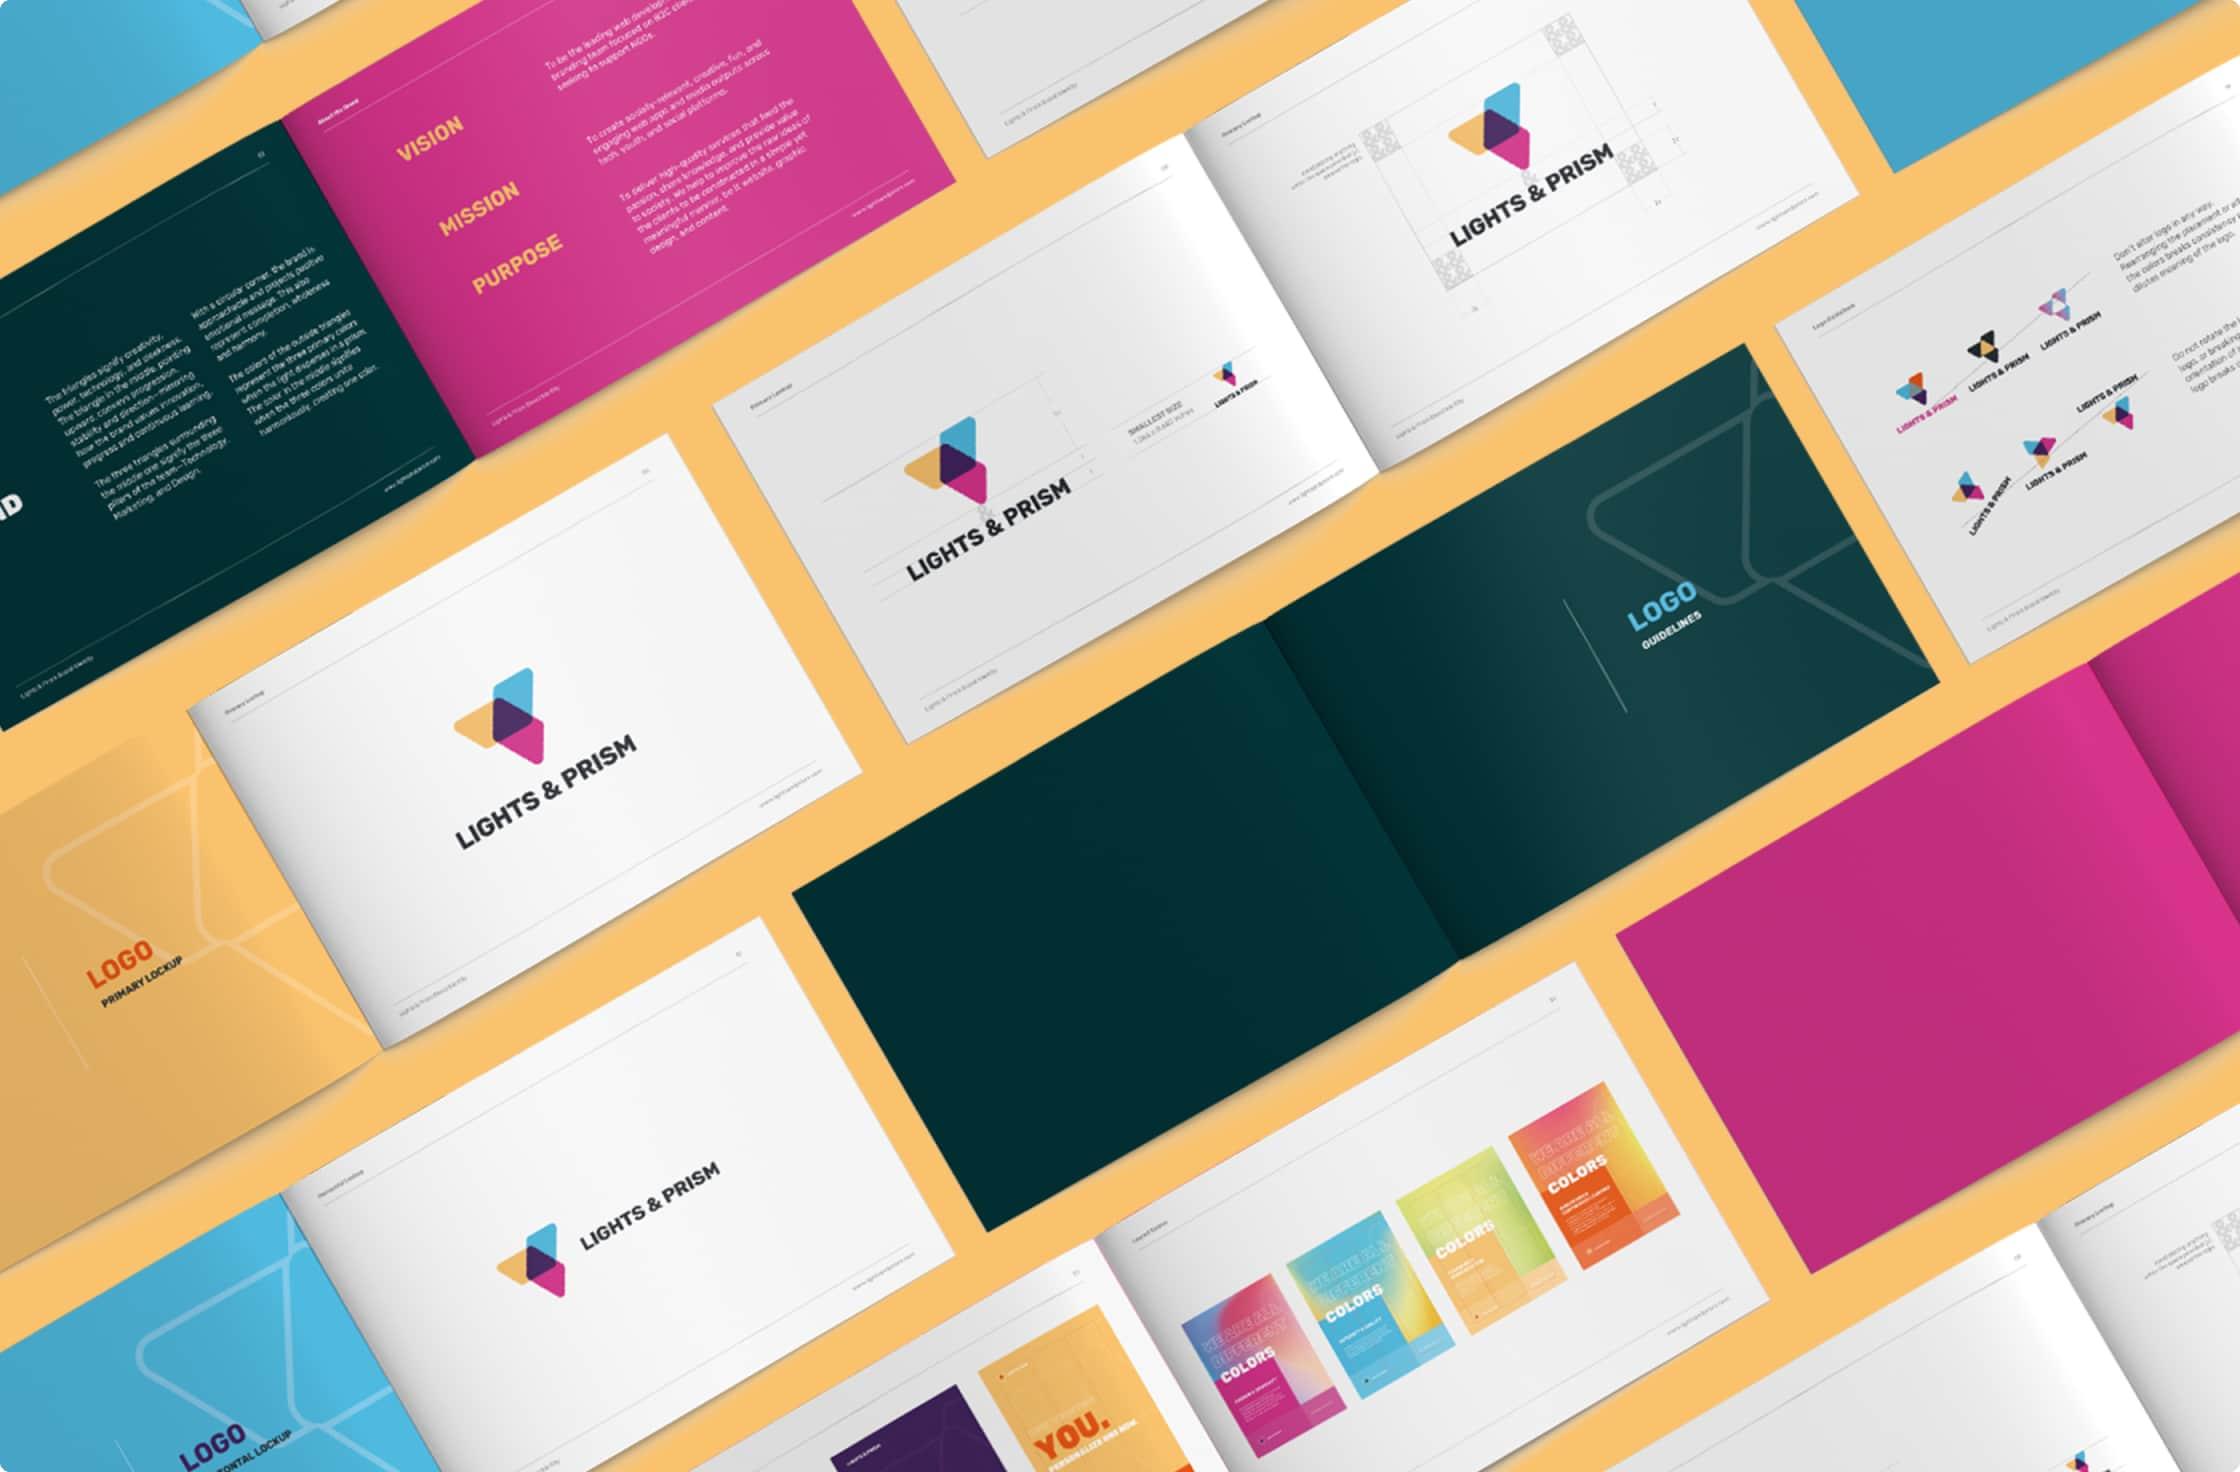 Brand's brand book